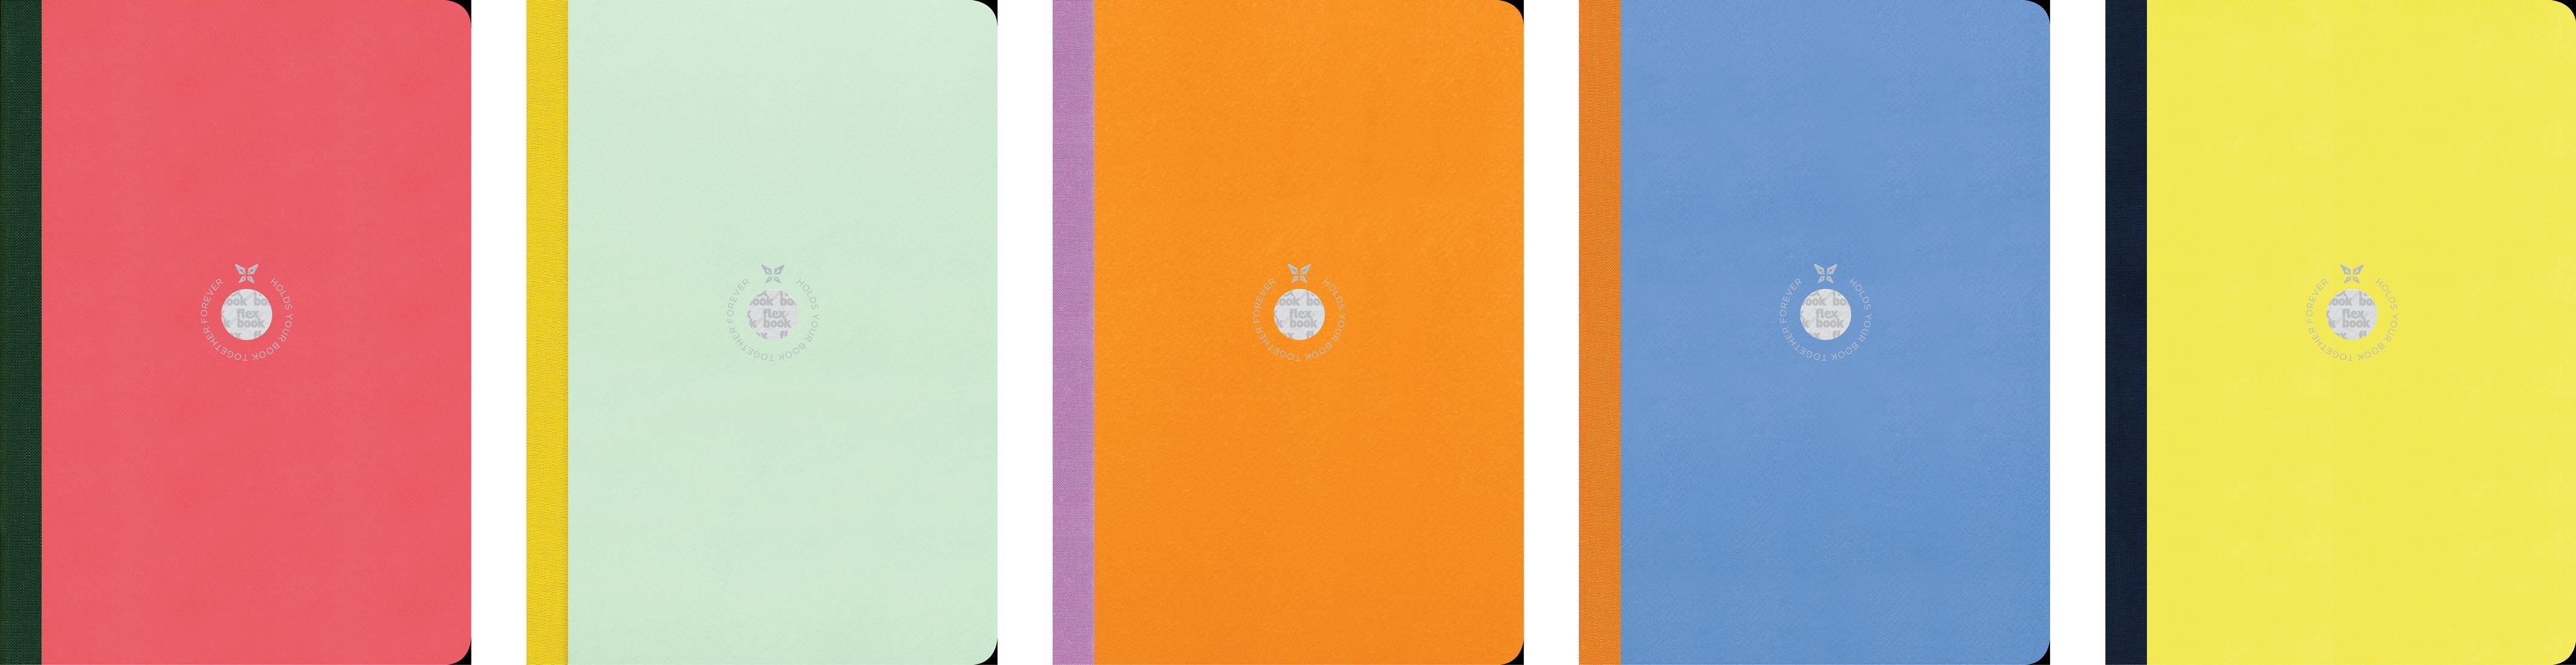 Flexbook Smartbook